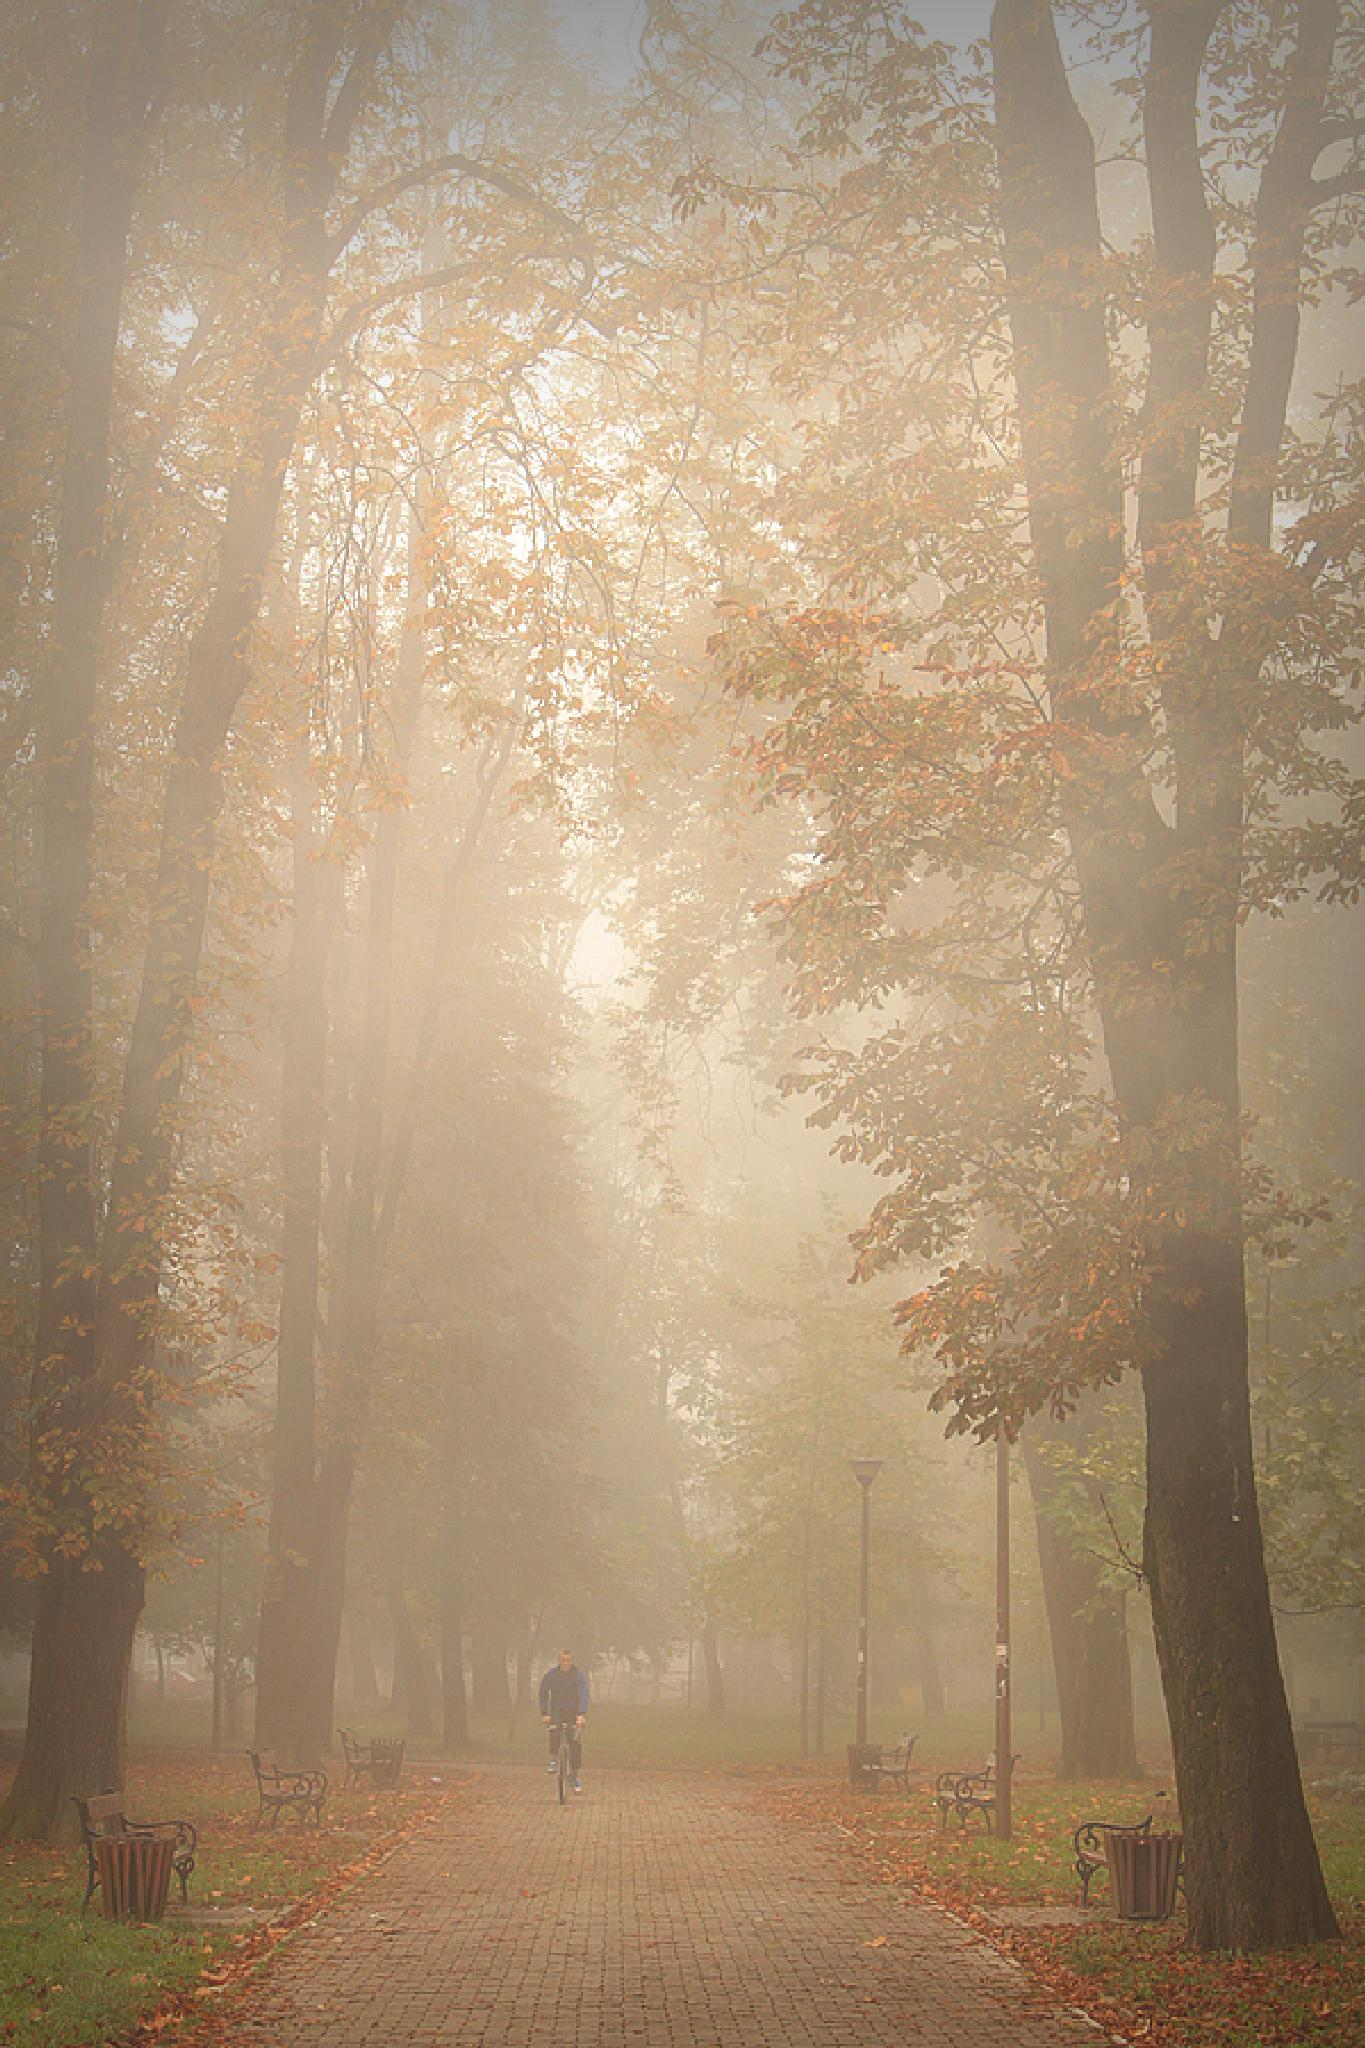 autumn park by lenka samardzic